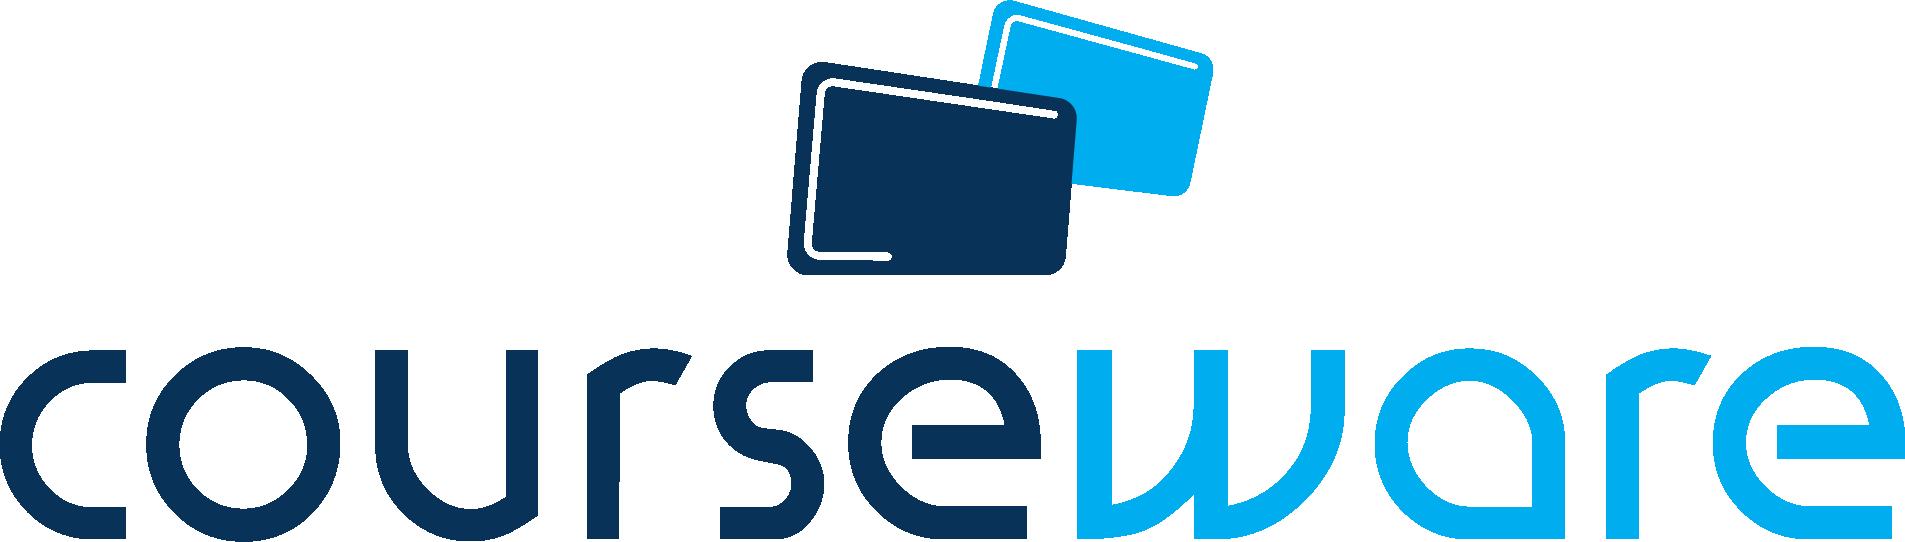 logo2-1